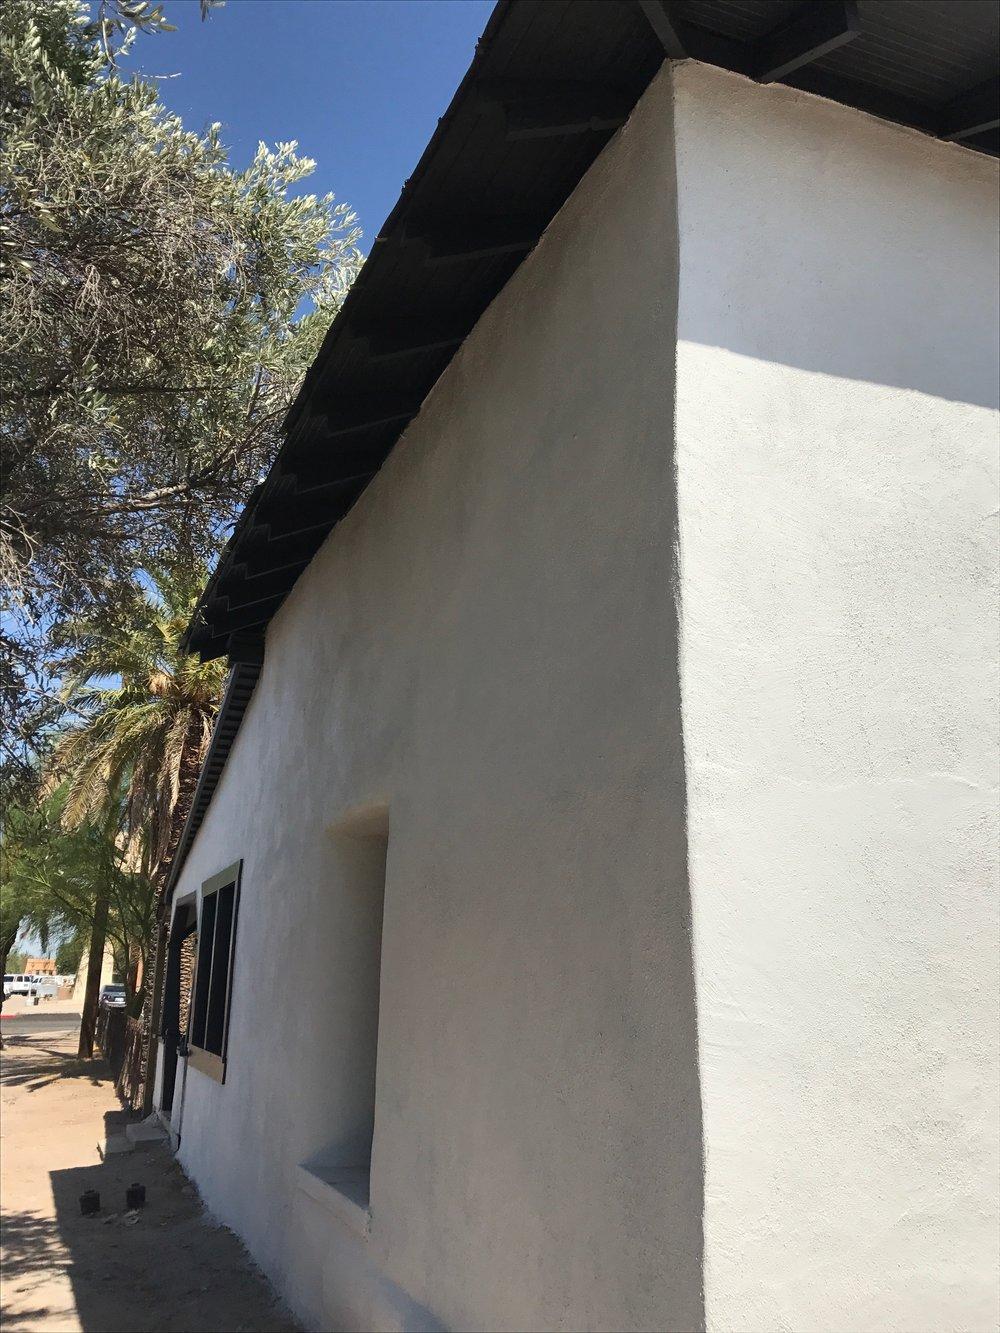 Rowhouse25 - Tremaine Ranch - Air BNB Rental - Phoenix, Arizona14.JPG